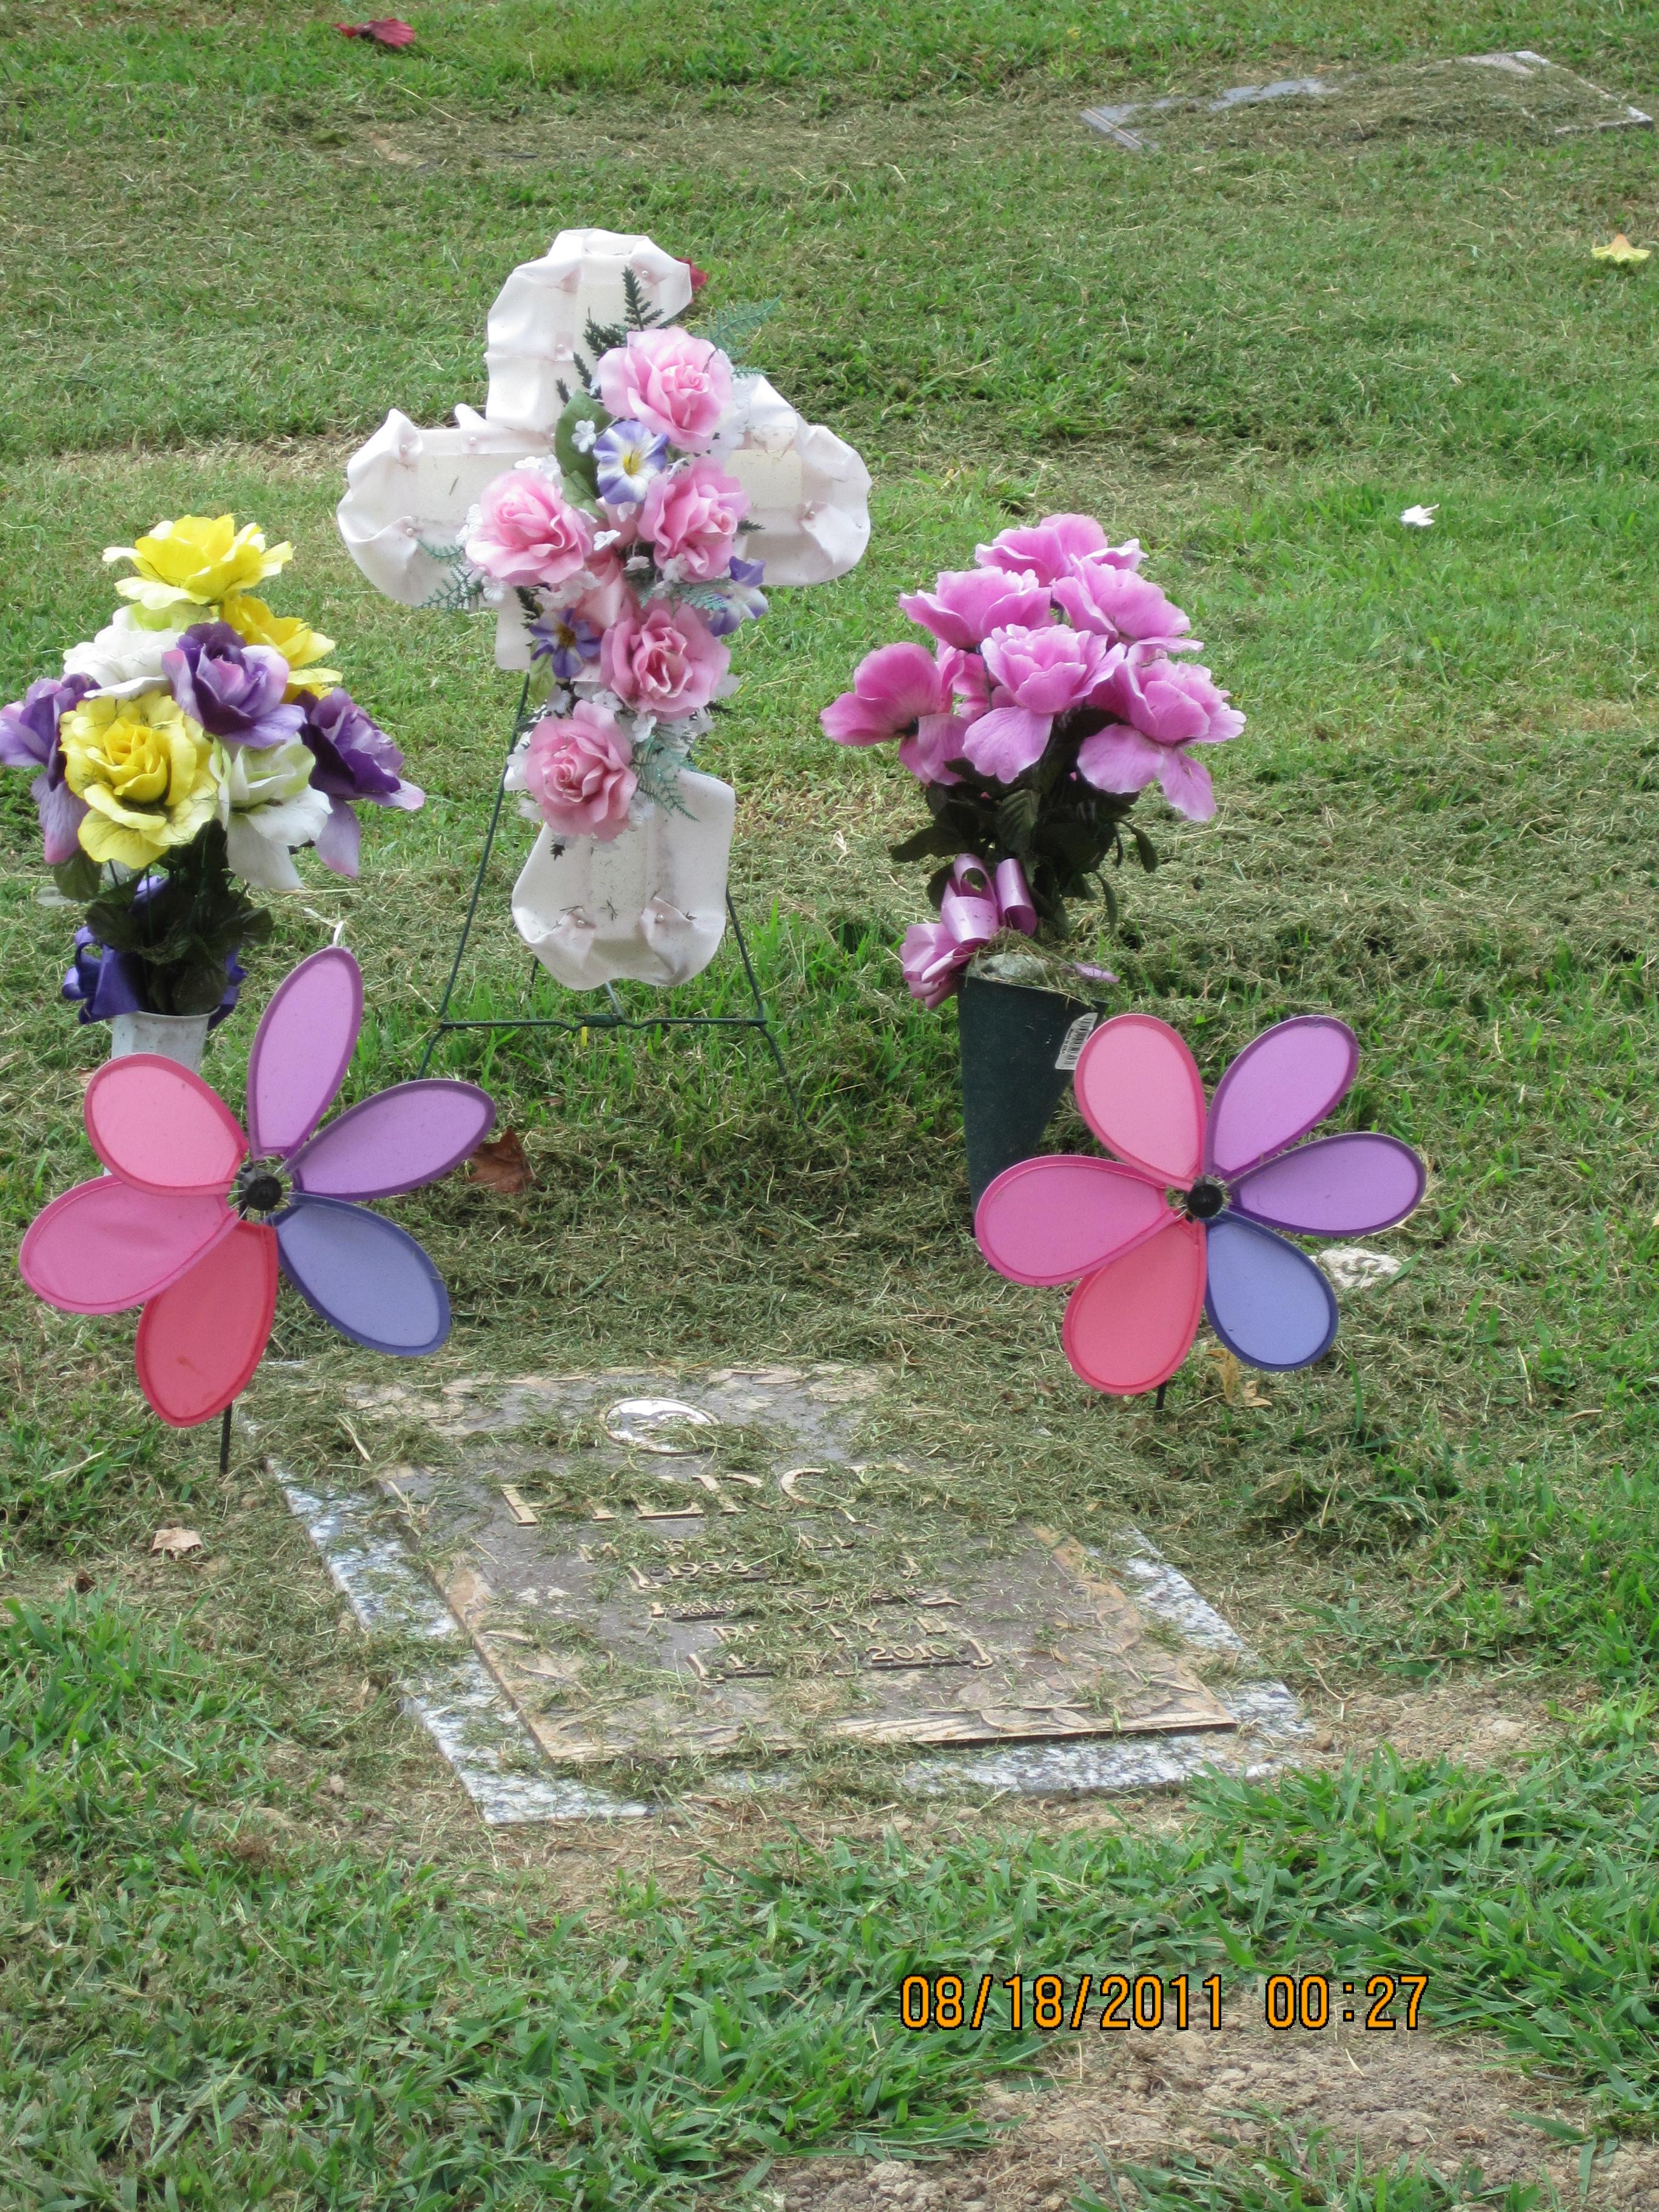 No Fake Flowers In Cemeteries? « Gravewords